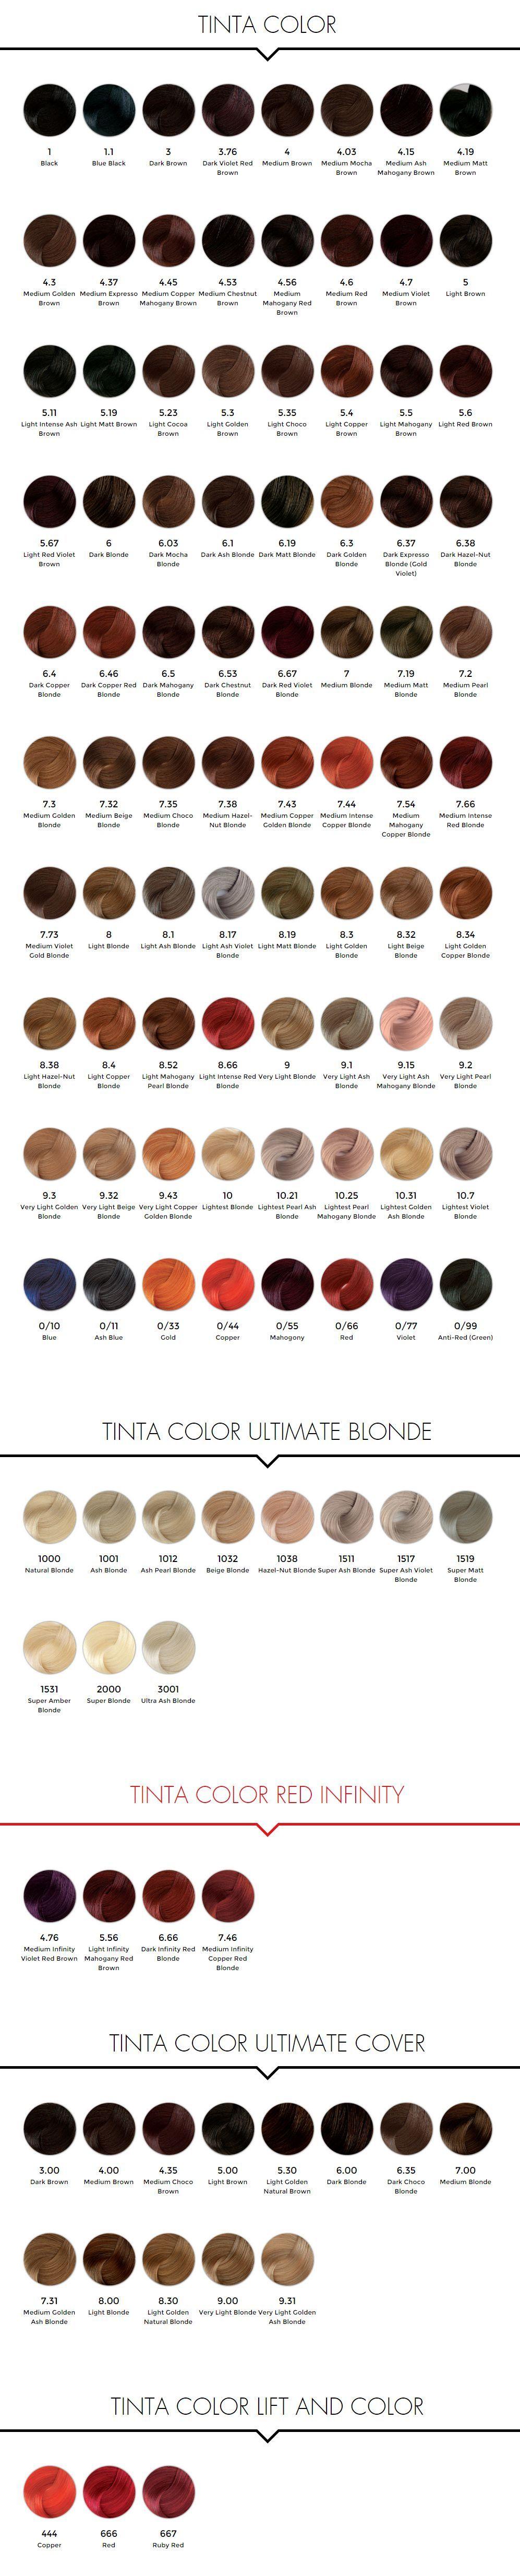 S Media Cache Ak0 Pinimg Com Originals 2c 64 42 2c6442cef0779f46d2f4e35bb153fe22 Jpg Hair Color Chart Beauty Hair Color Blonde Hair Color